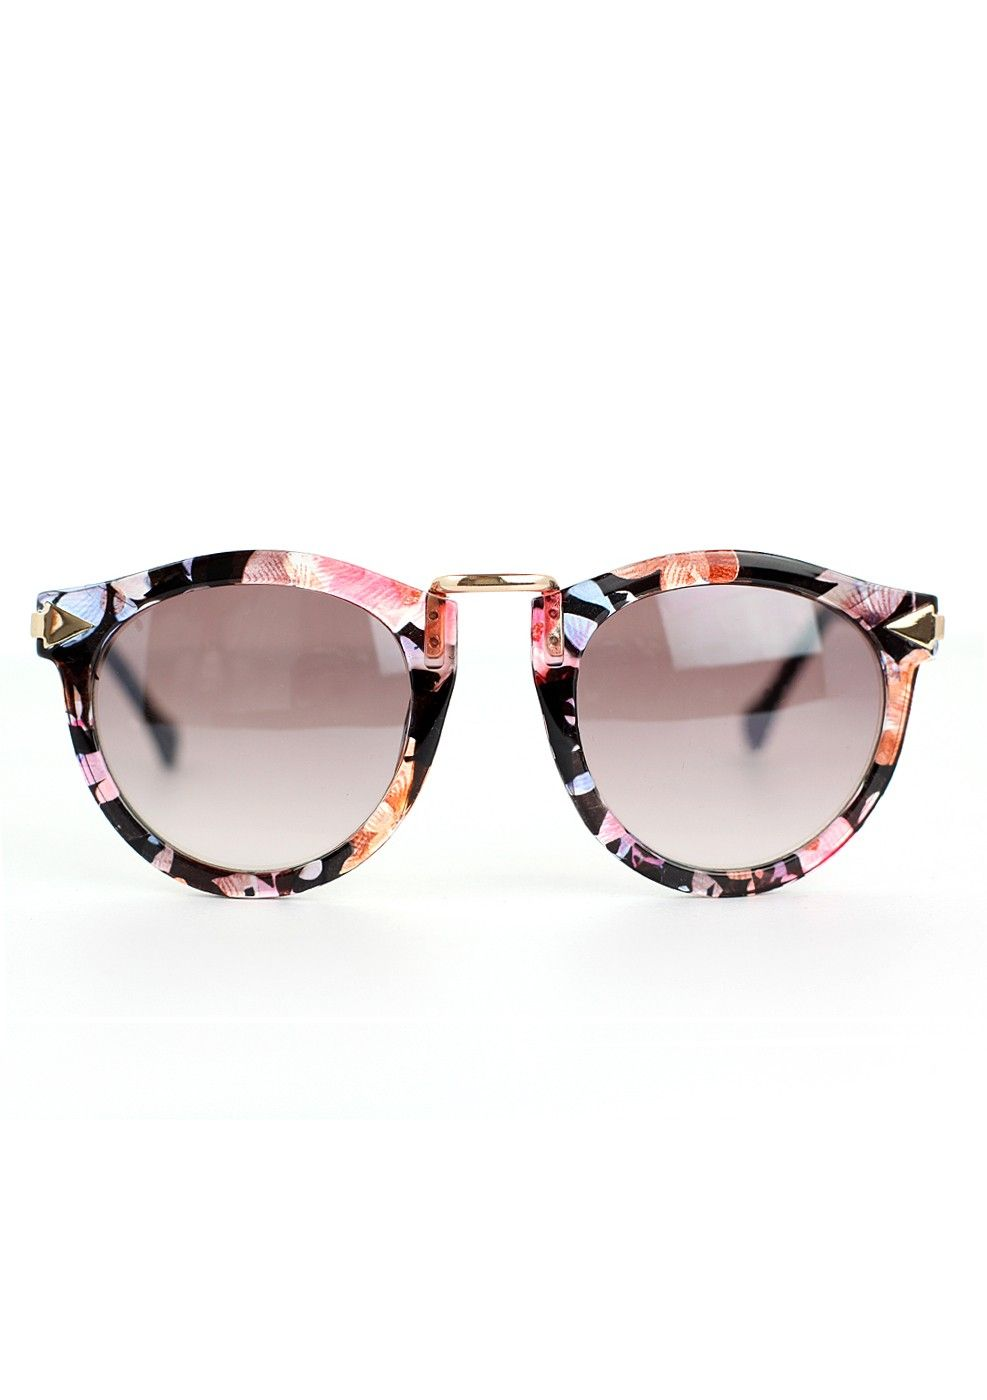 45e6fec165 Chicwish Multi-Color Sunglasses with Metal Detail